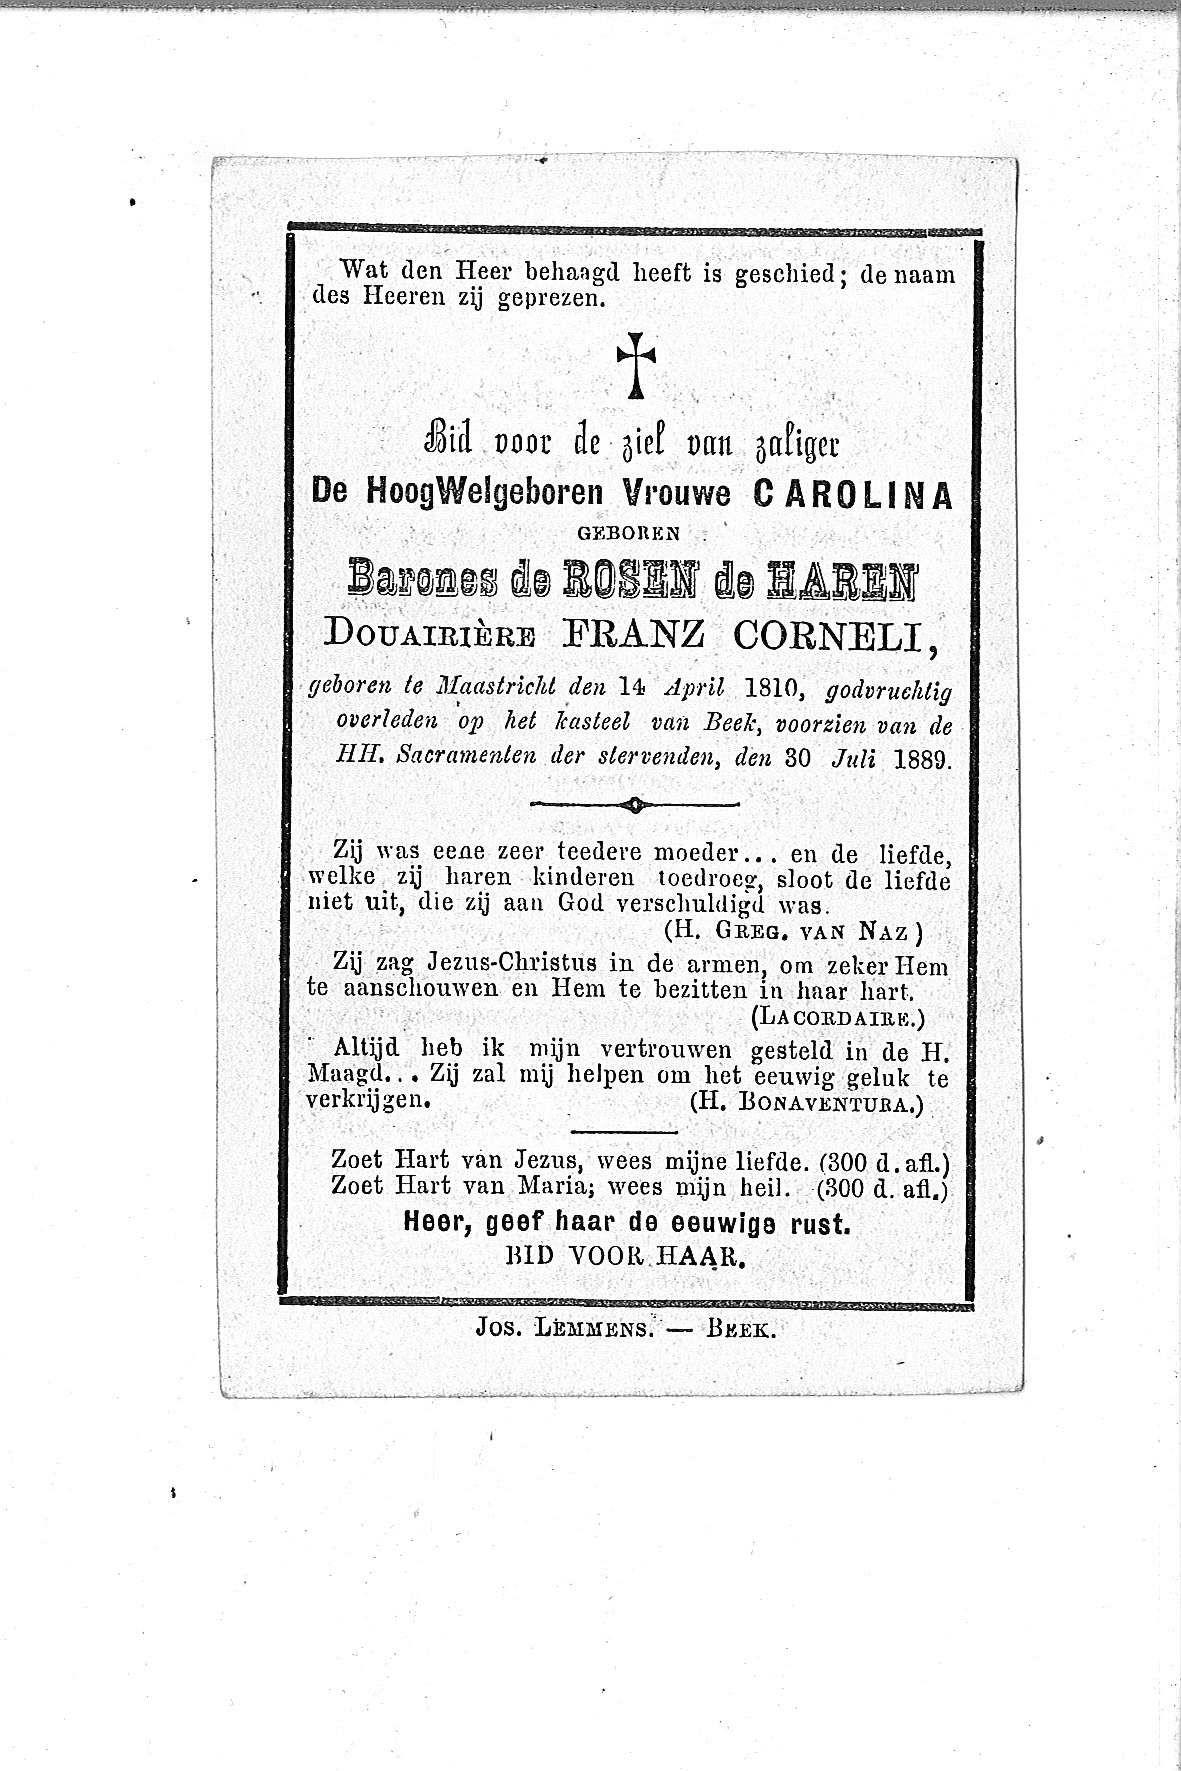 Carolina-(1889)-20120803115057_00203.jpg